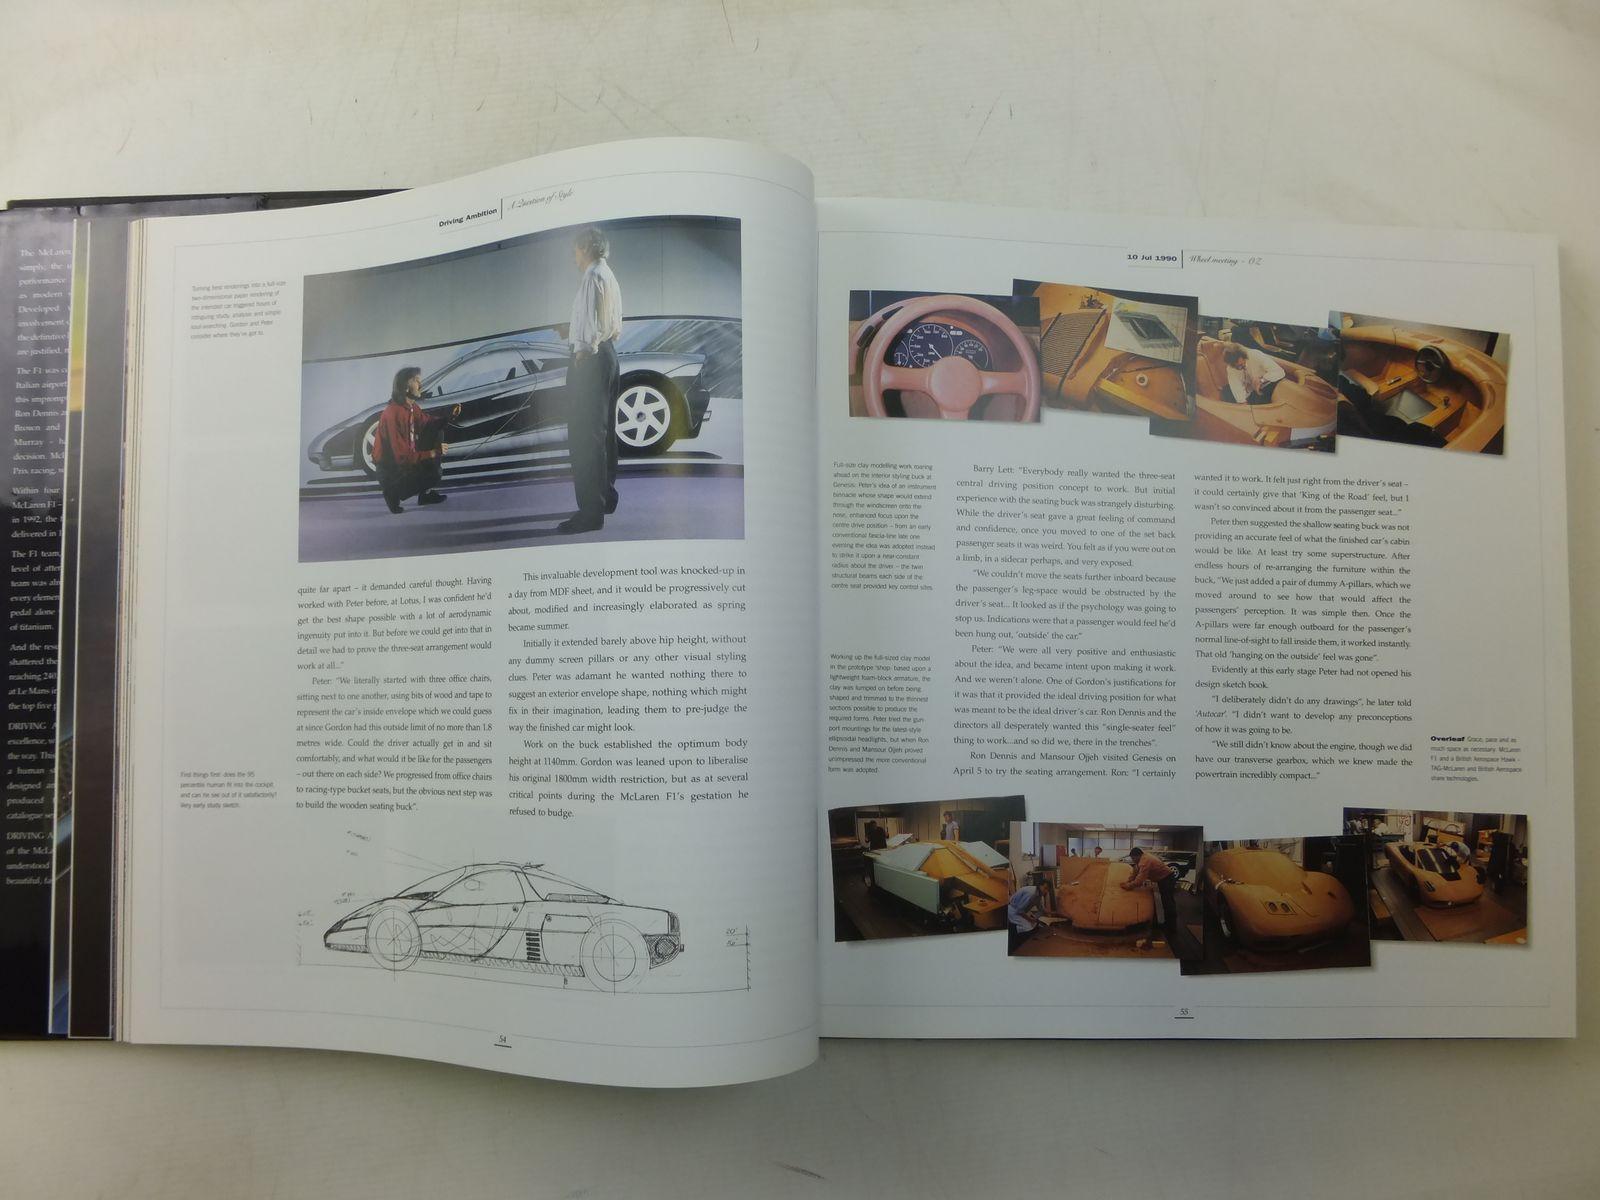 driving ambition mclaren f1 pdf